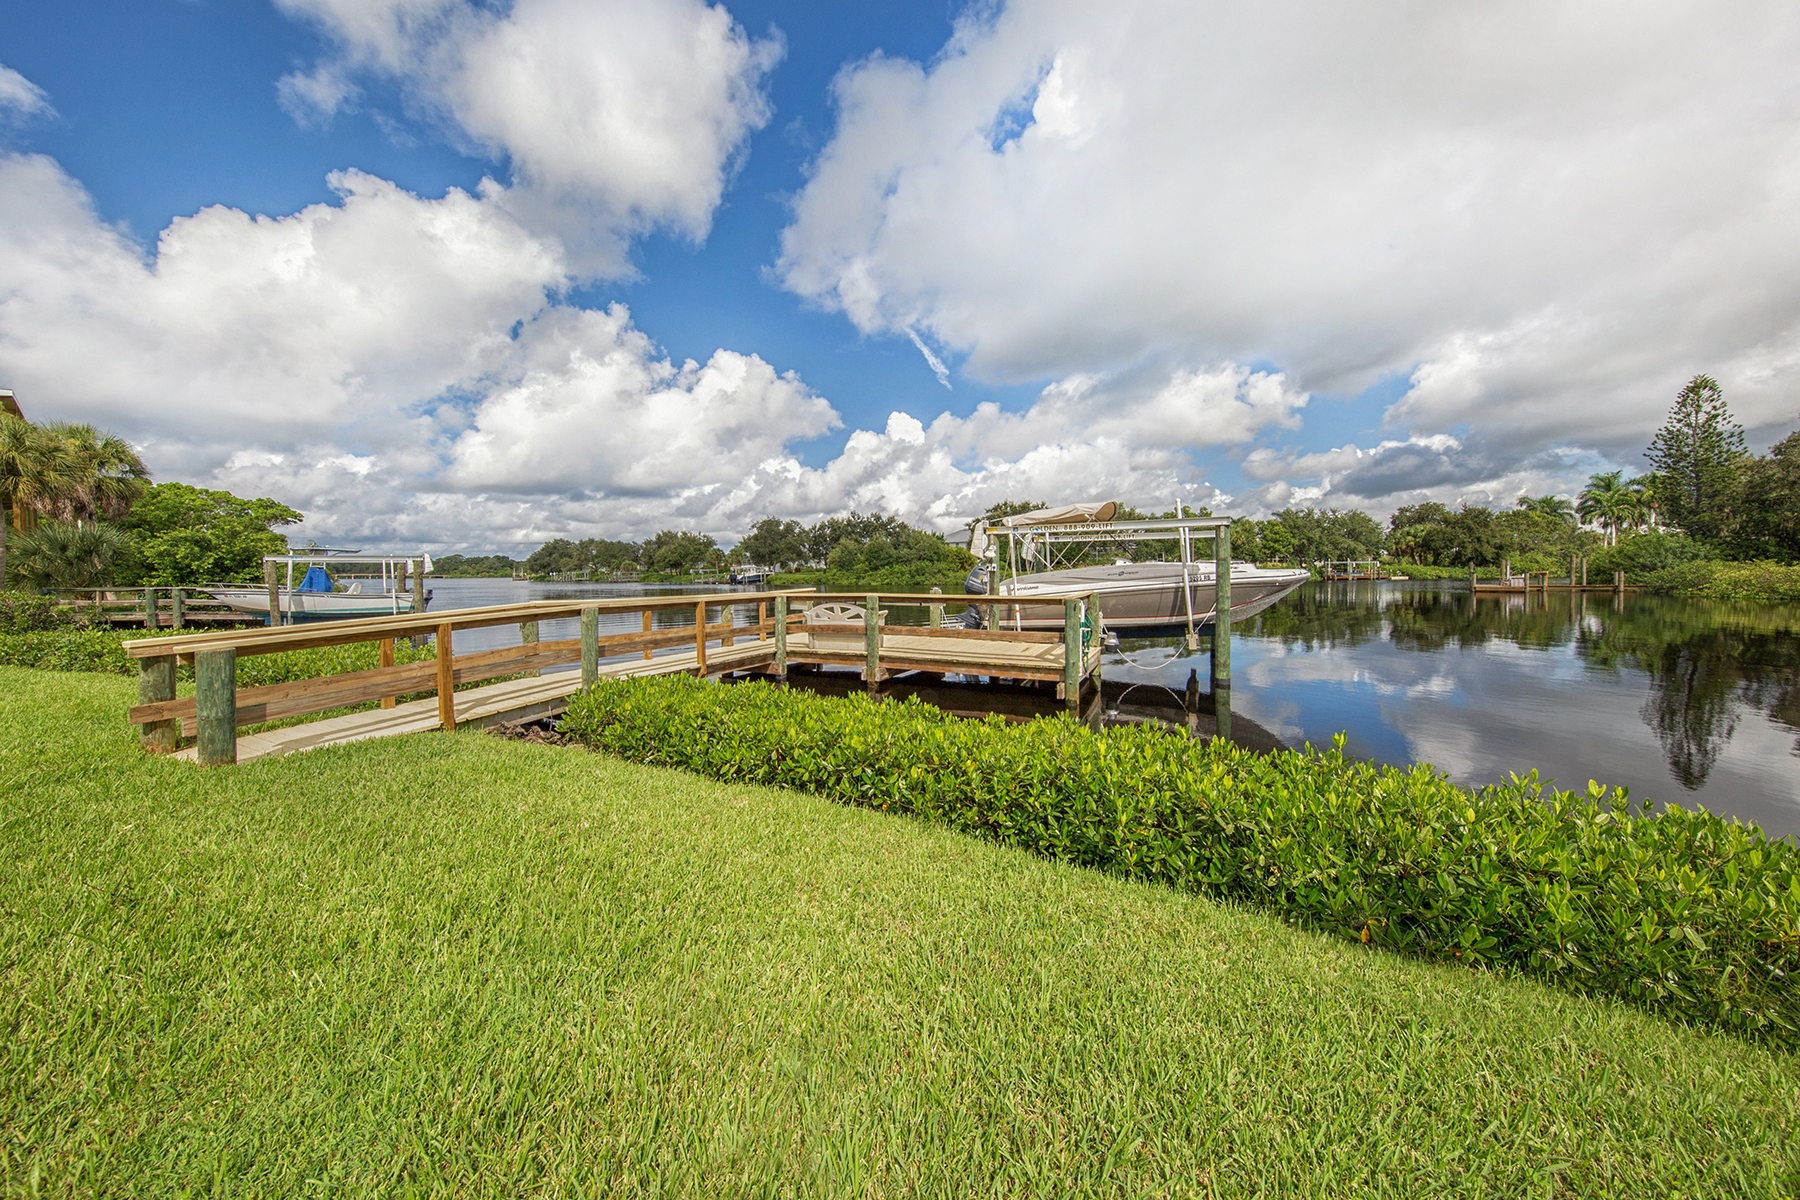 Land for Sale at NOKOMIS 904 Lucille Ave 000 Nokomis, Florida, 34275 United States